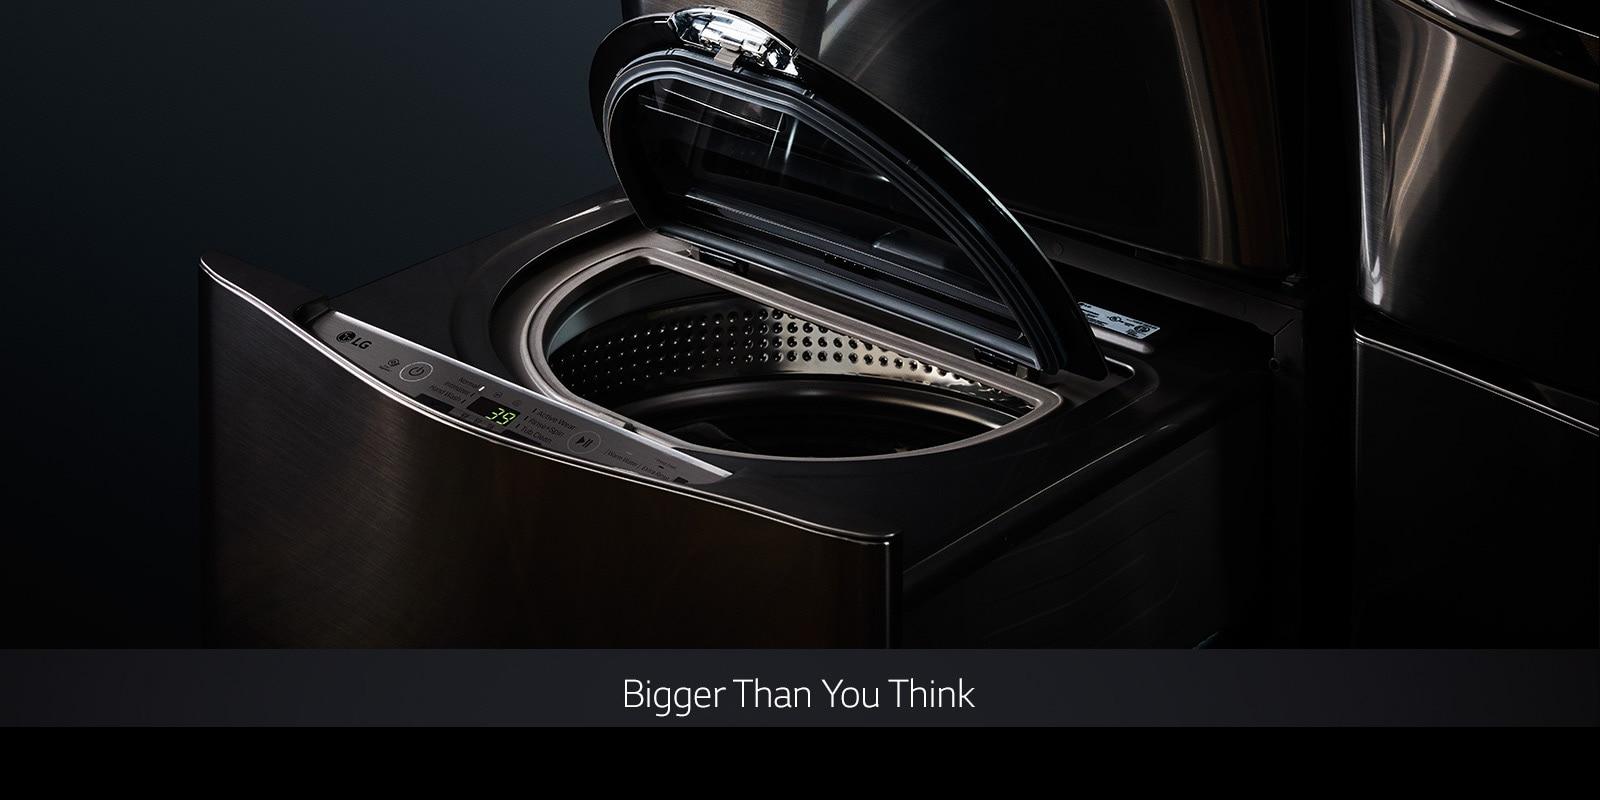 LG TWINWash™: Dual Washer w/ Flexible Washing Options | LG USA